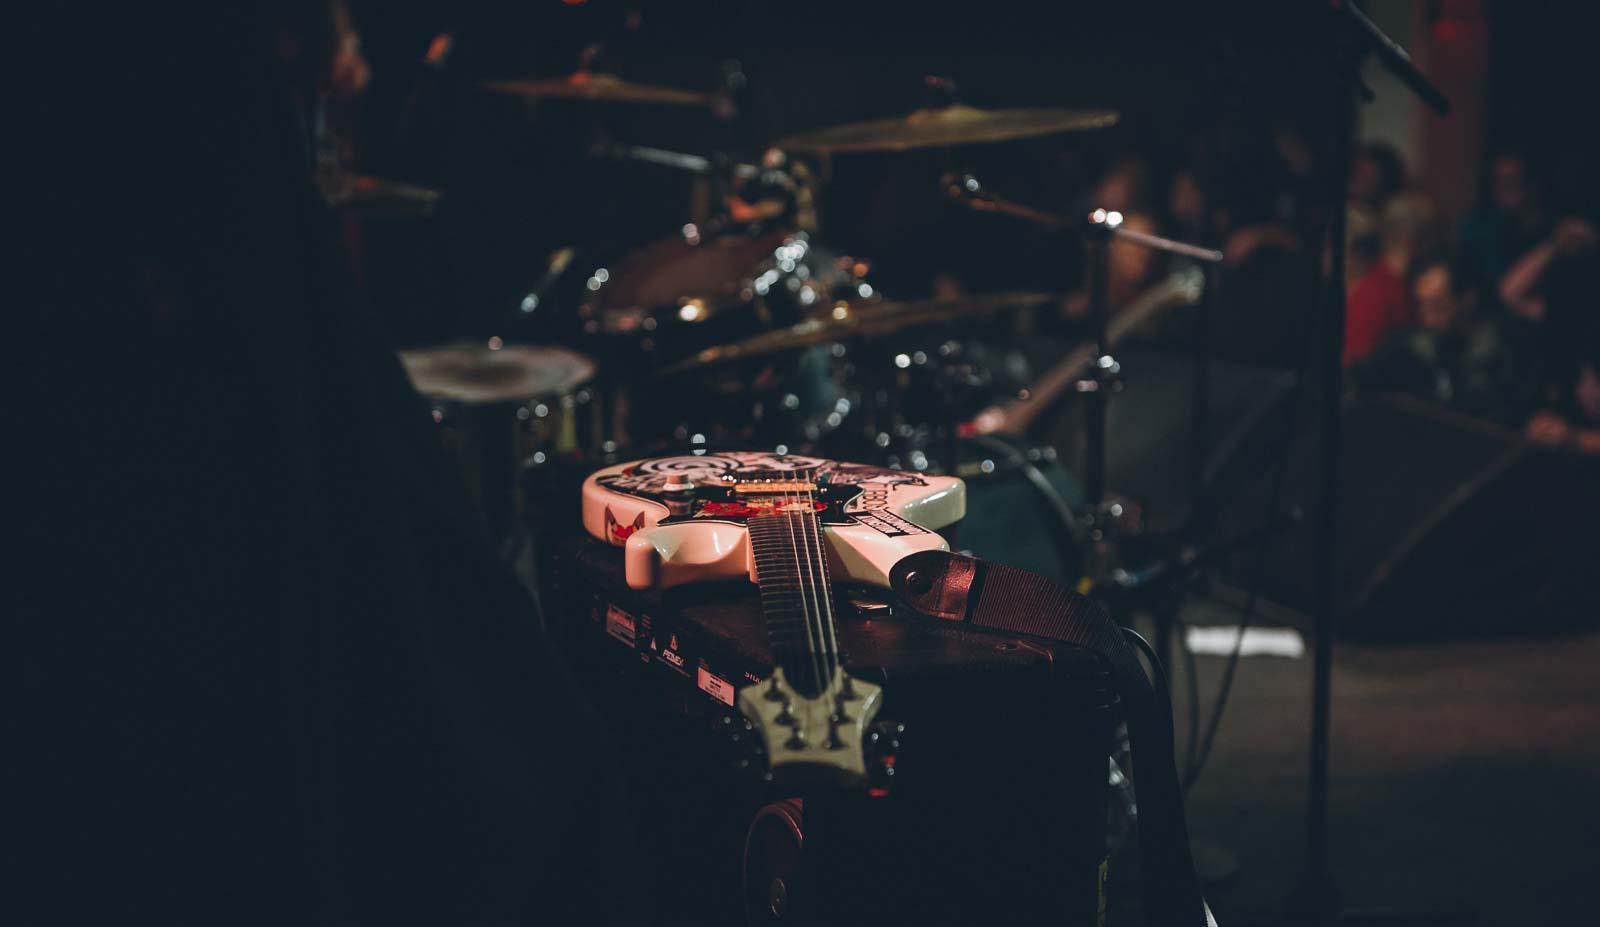 Gitarre on stage – Konzert Fotos Berlin